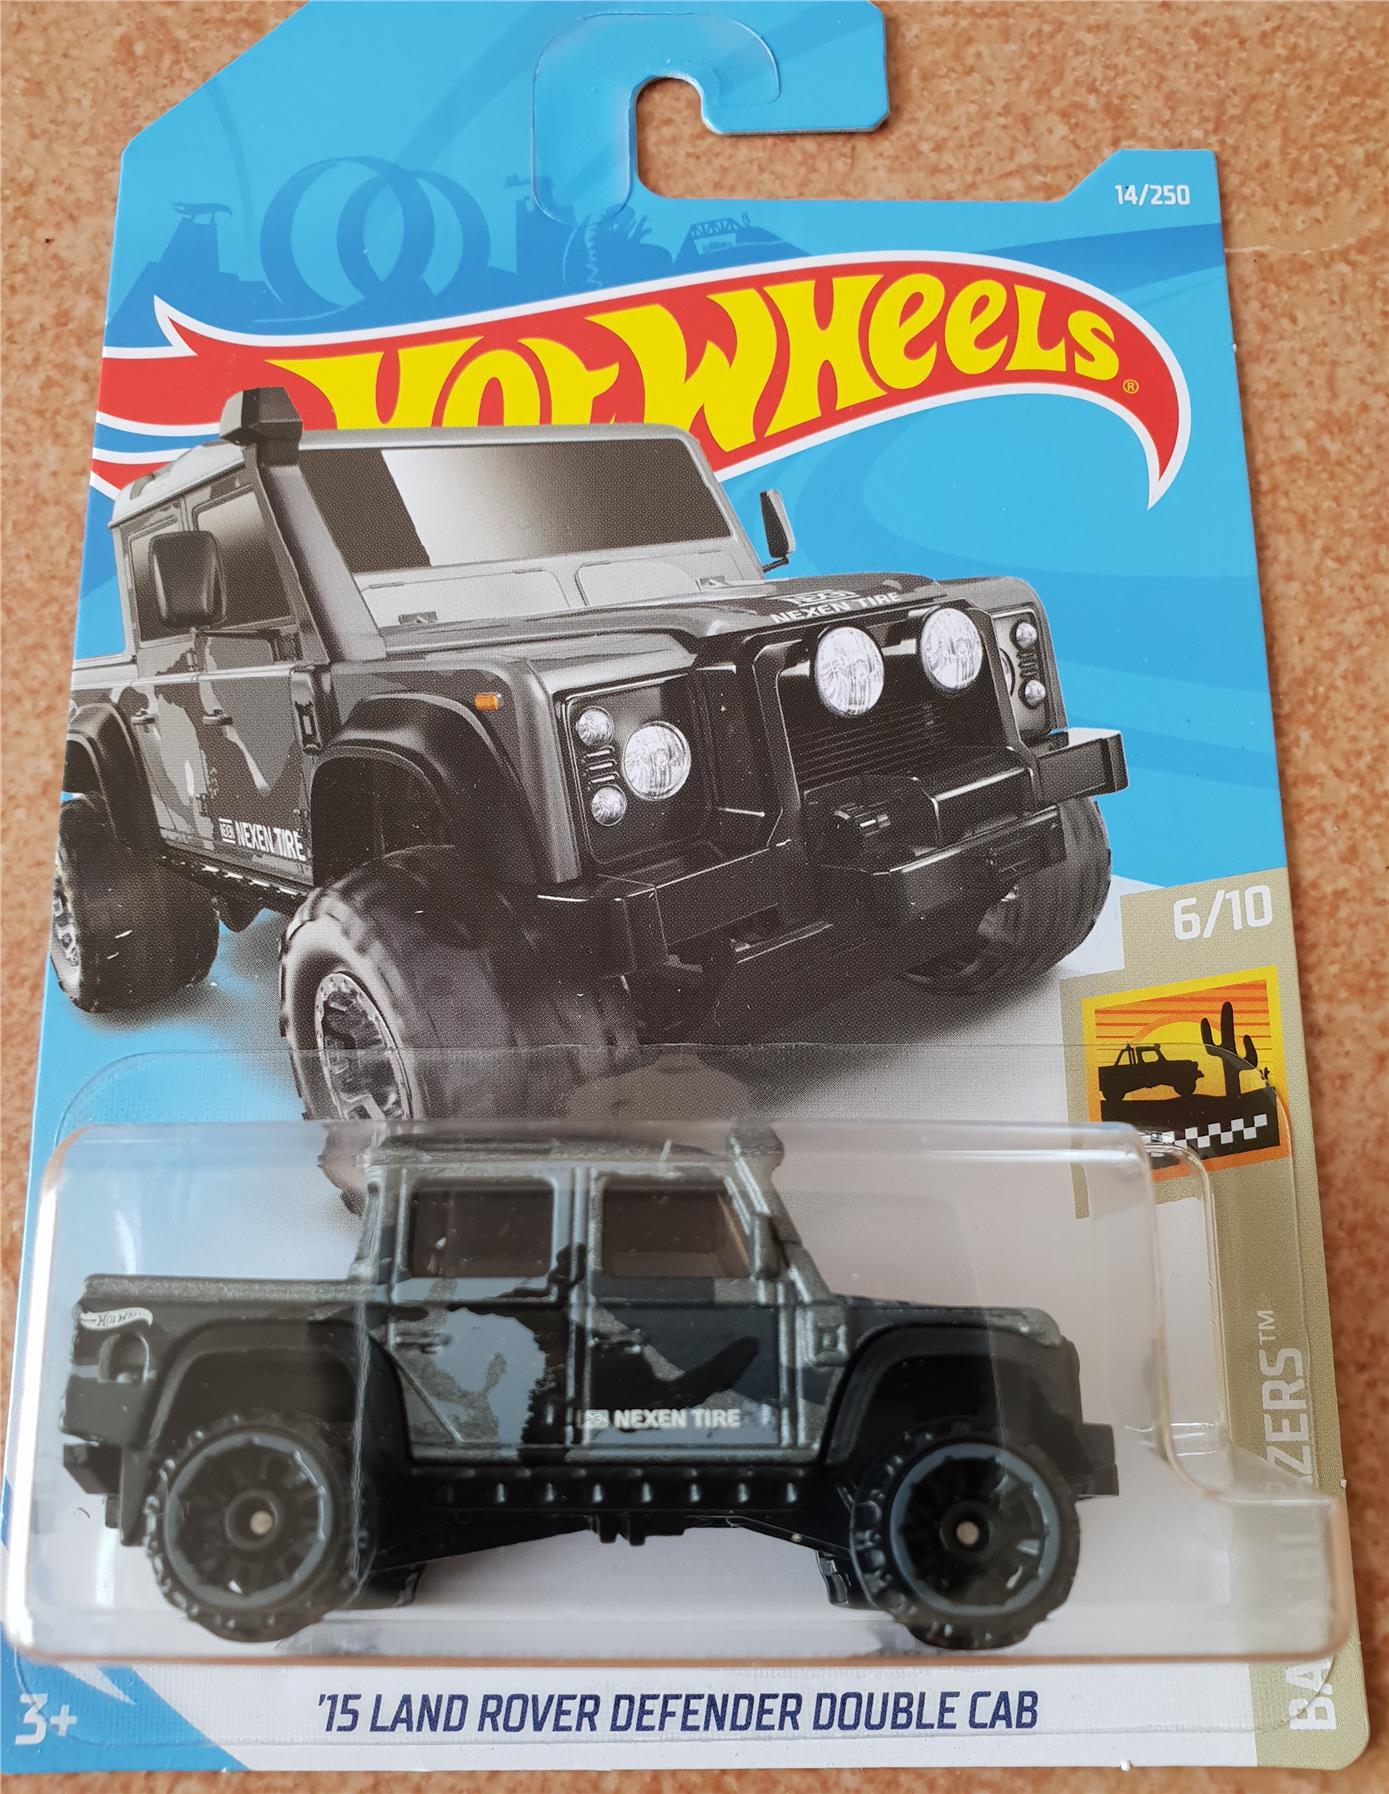 hot wheels 15 land rover defender do (end 12/9/2019 9:15 am)